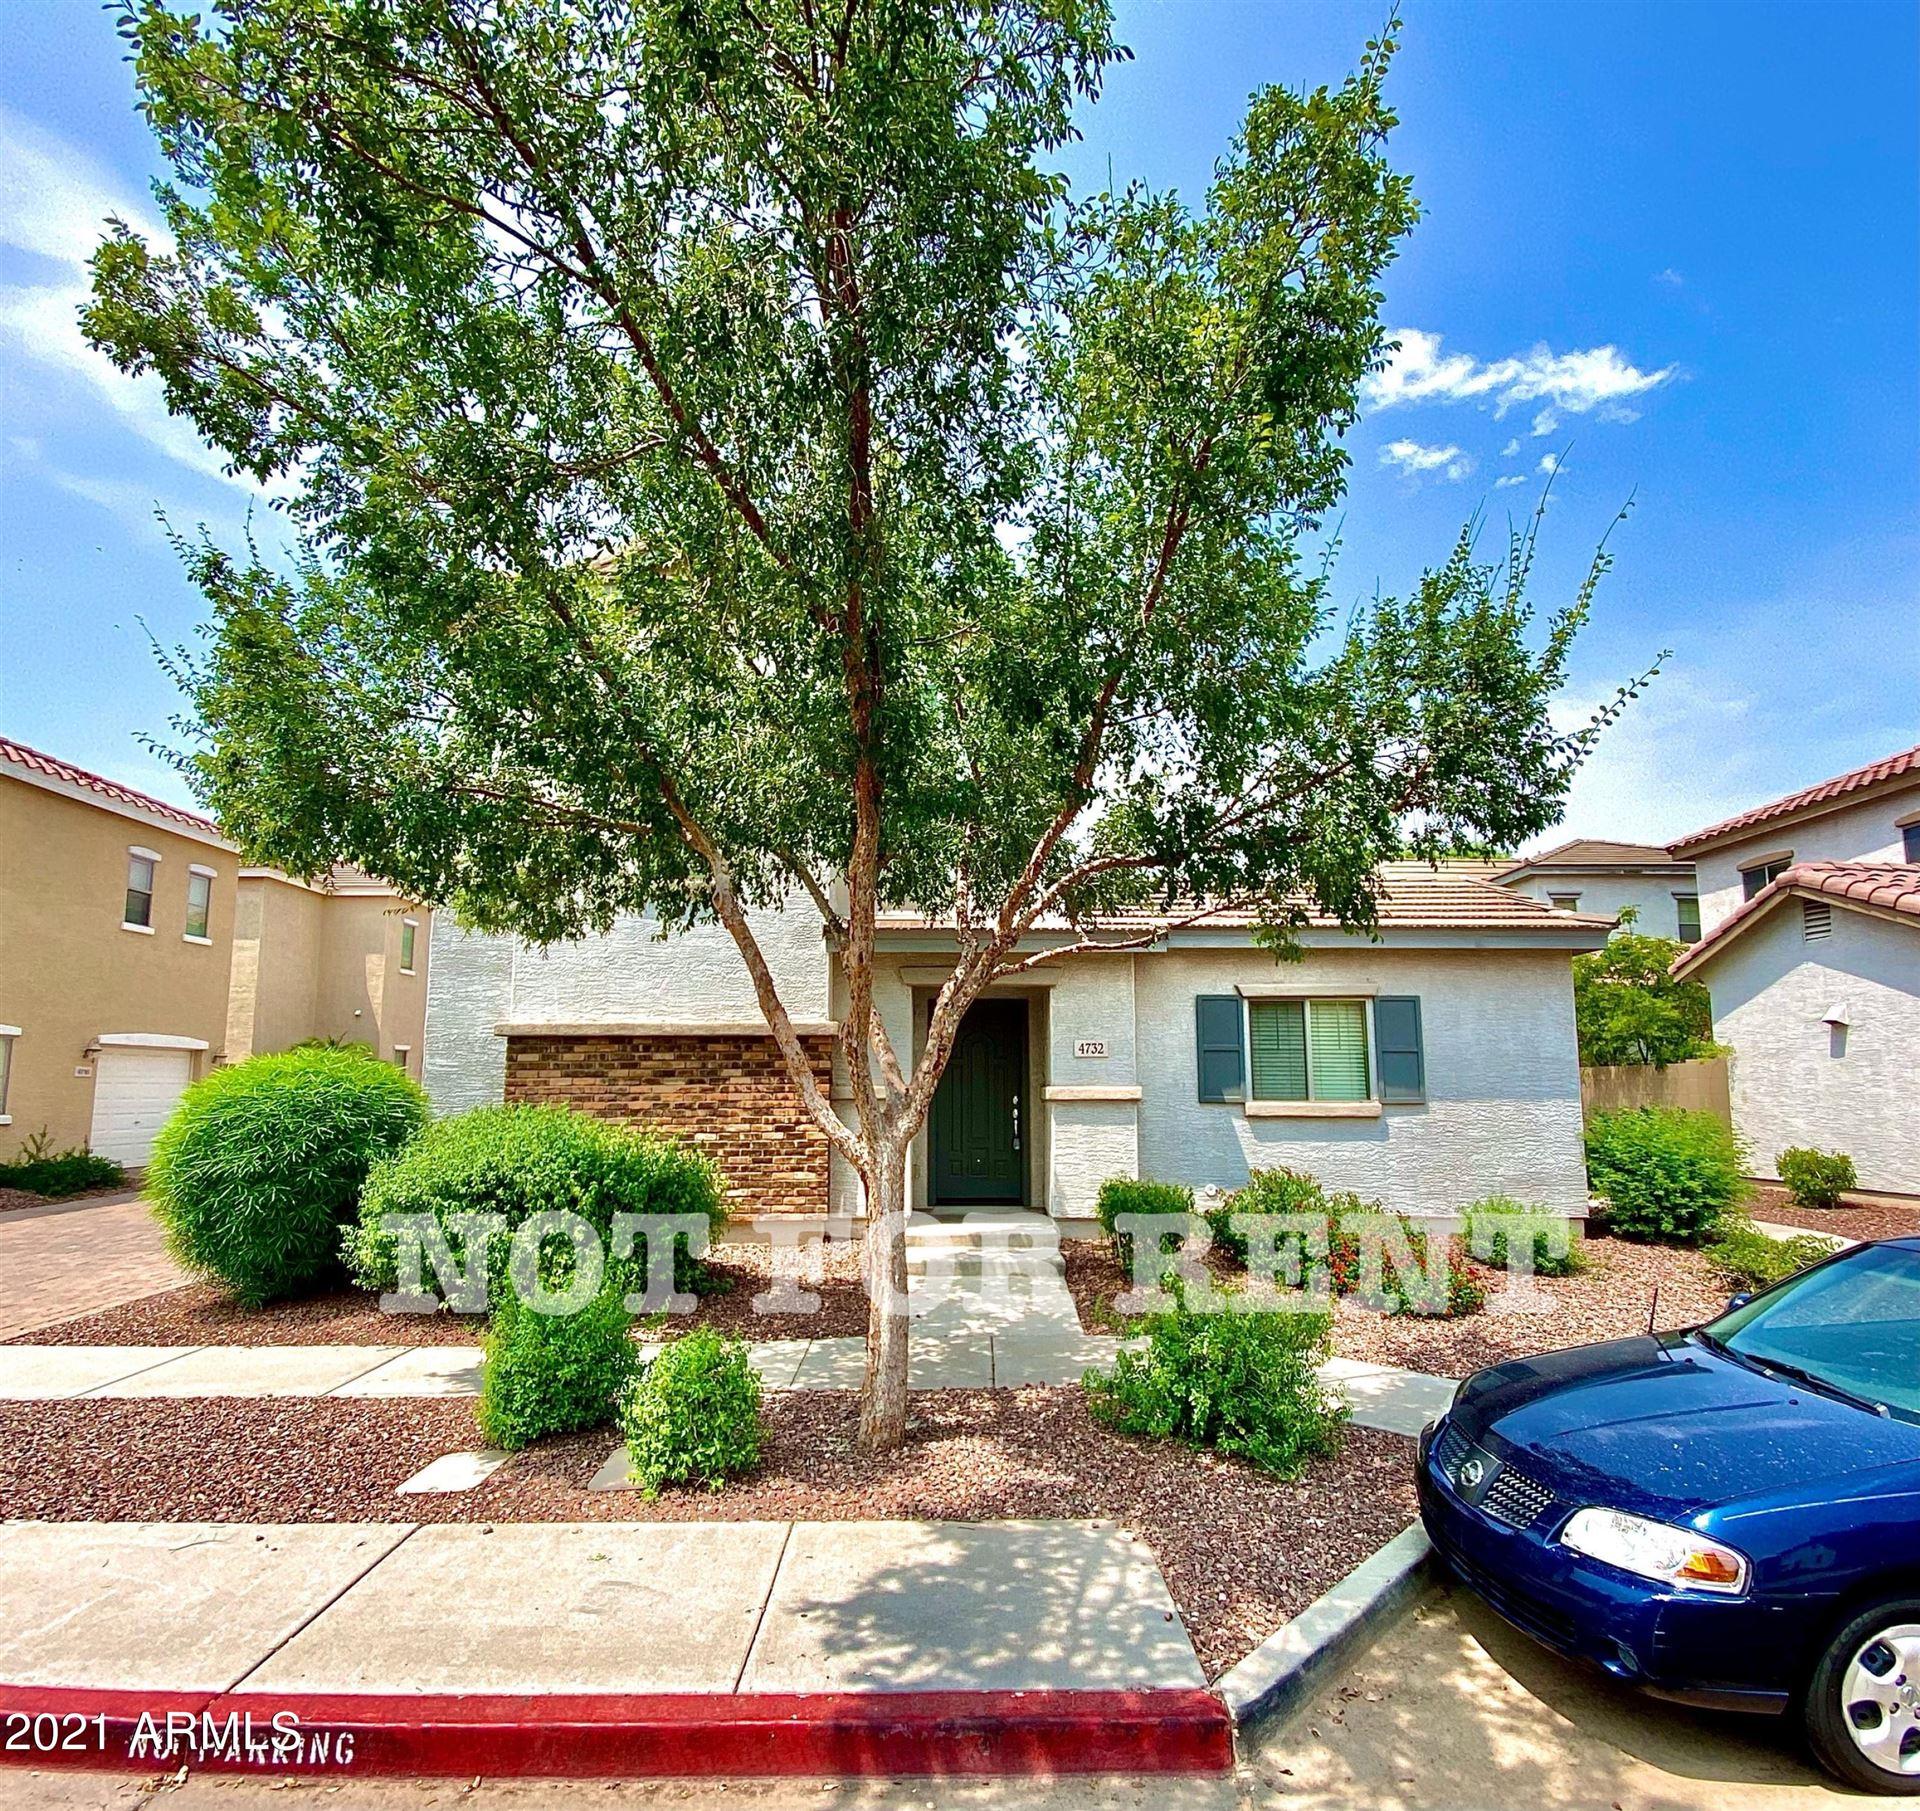 Photo of 4732 E LAUREL Avenue, Gilbert, AZ 85234 (MLS # 6268892)